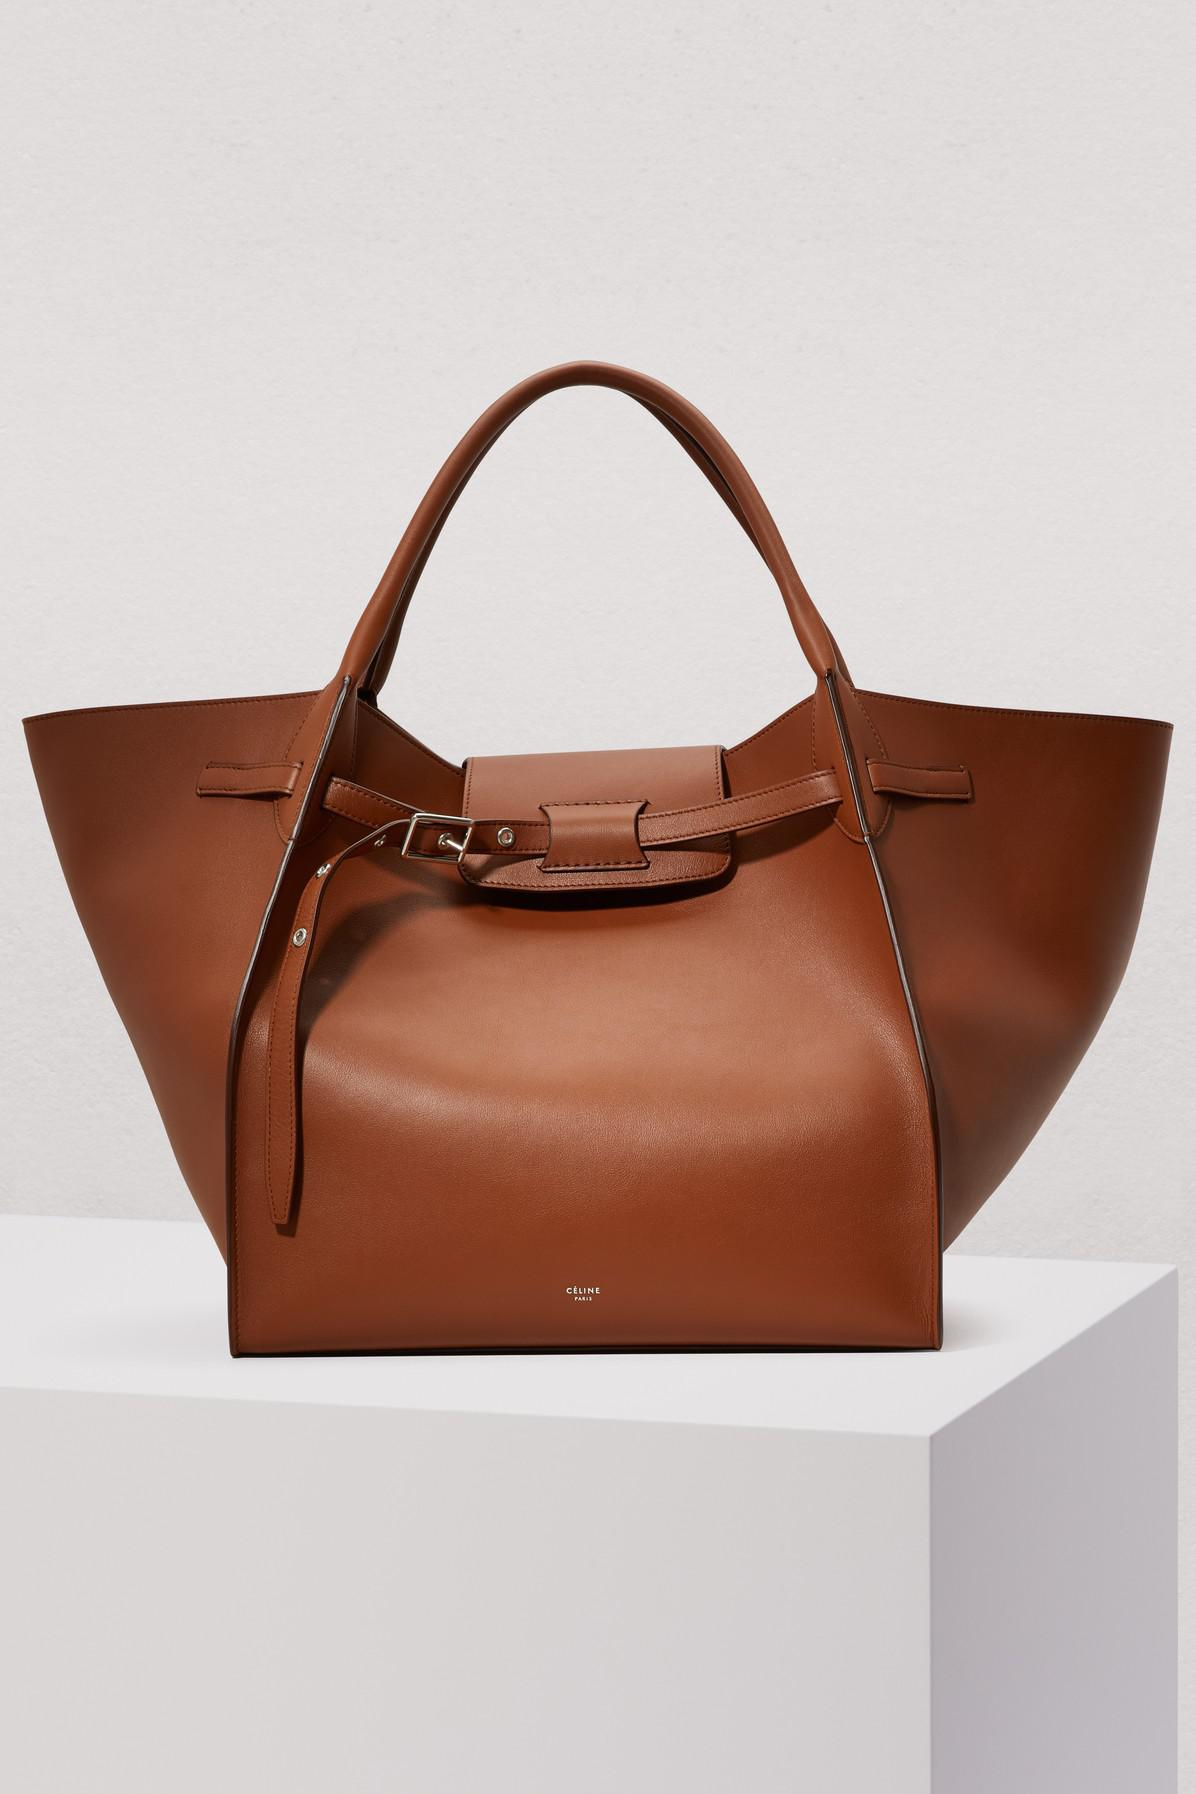 94937baa22 Lyst - Céline Medium Big Bag In Smooth Calfskin in Brown